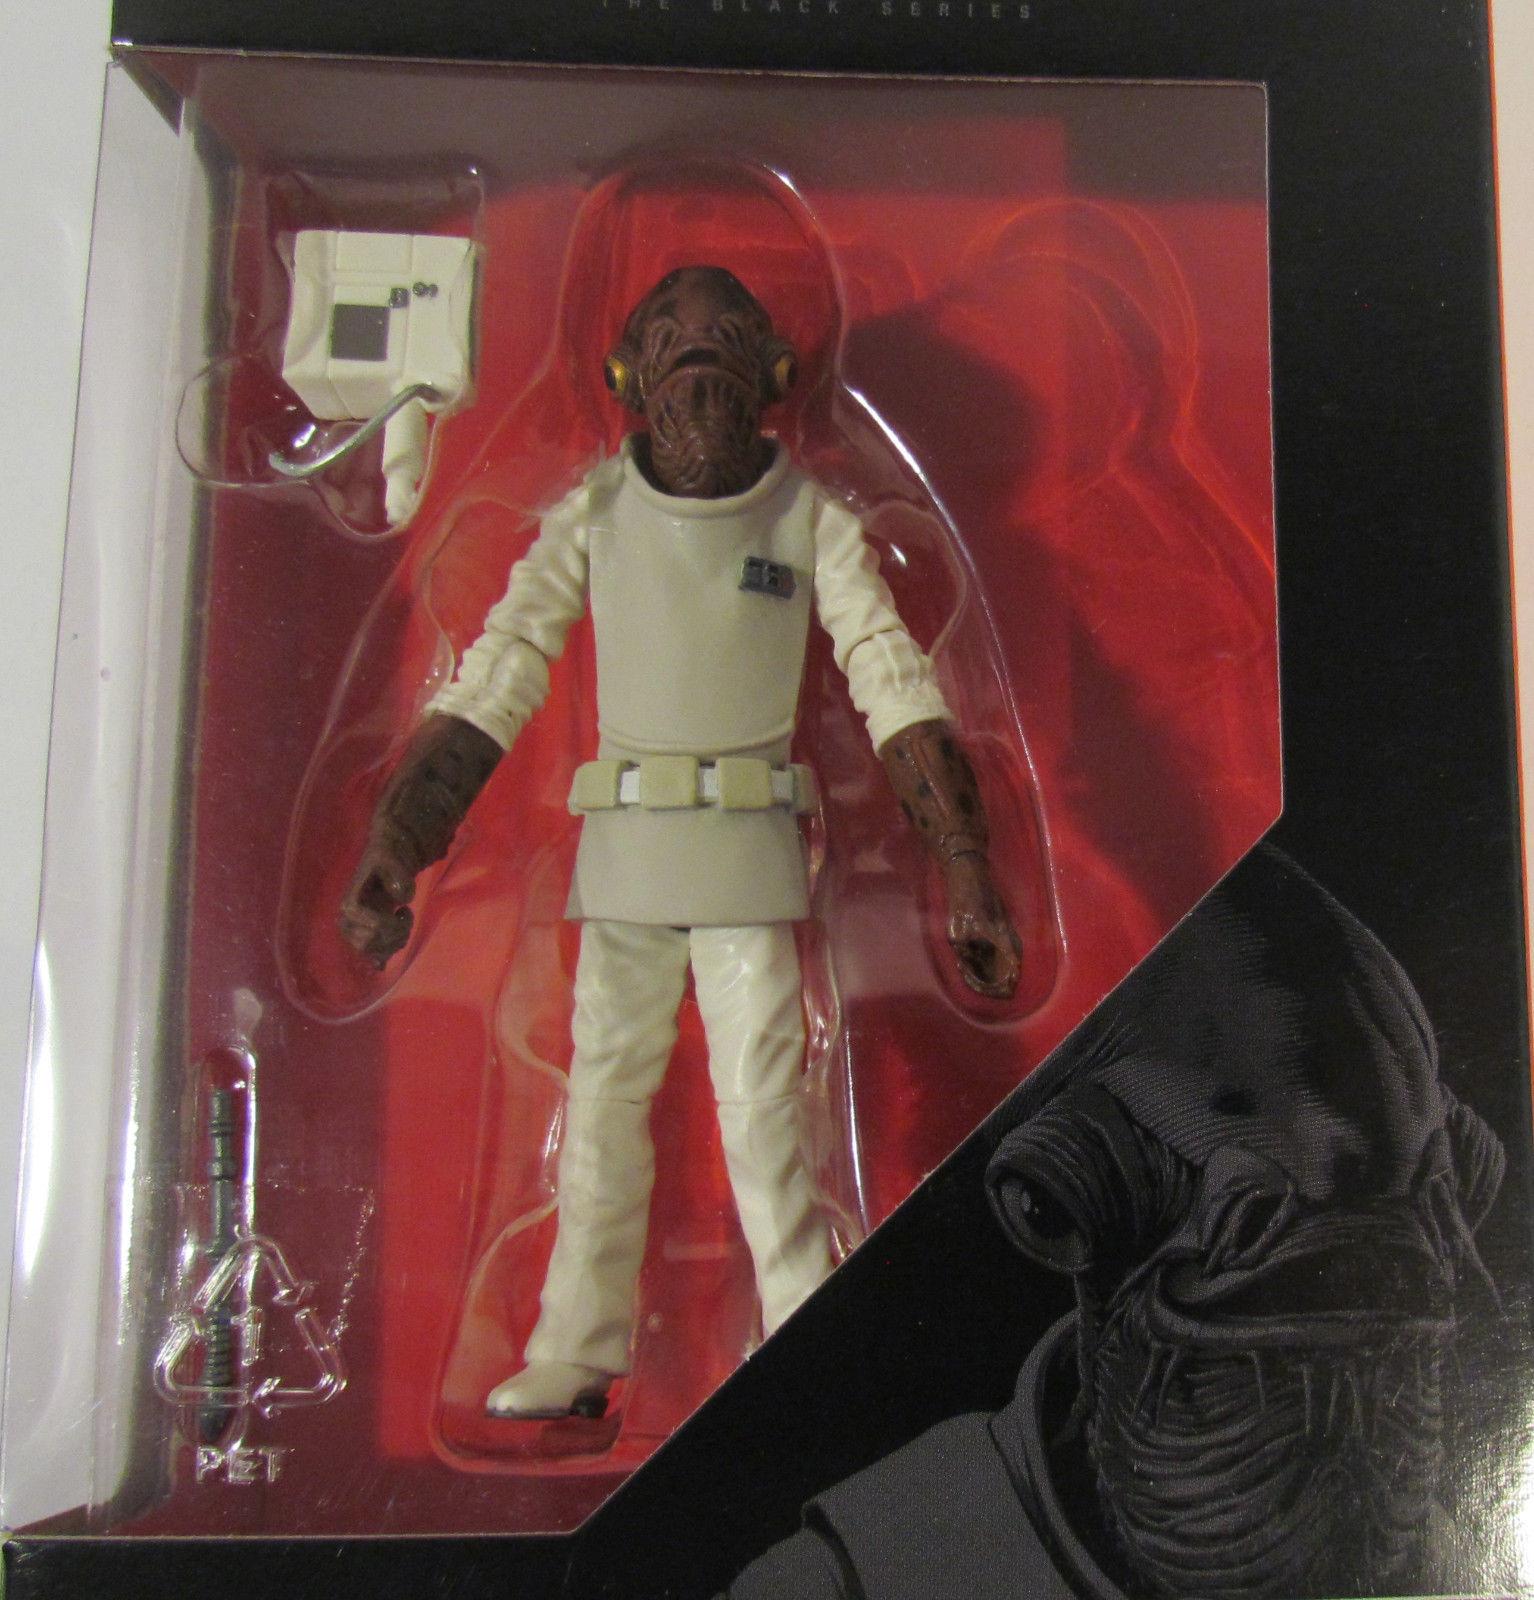 Disney Hasbro Star Wars Black Series Admiral Ackbar 3.75in Figure